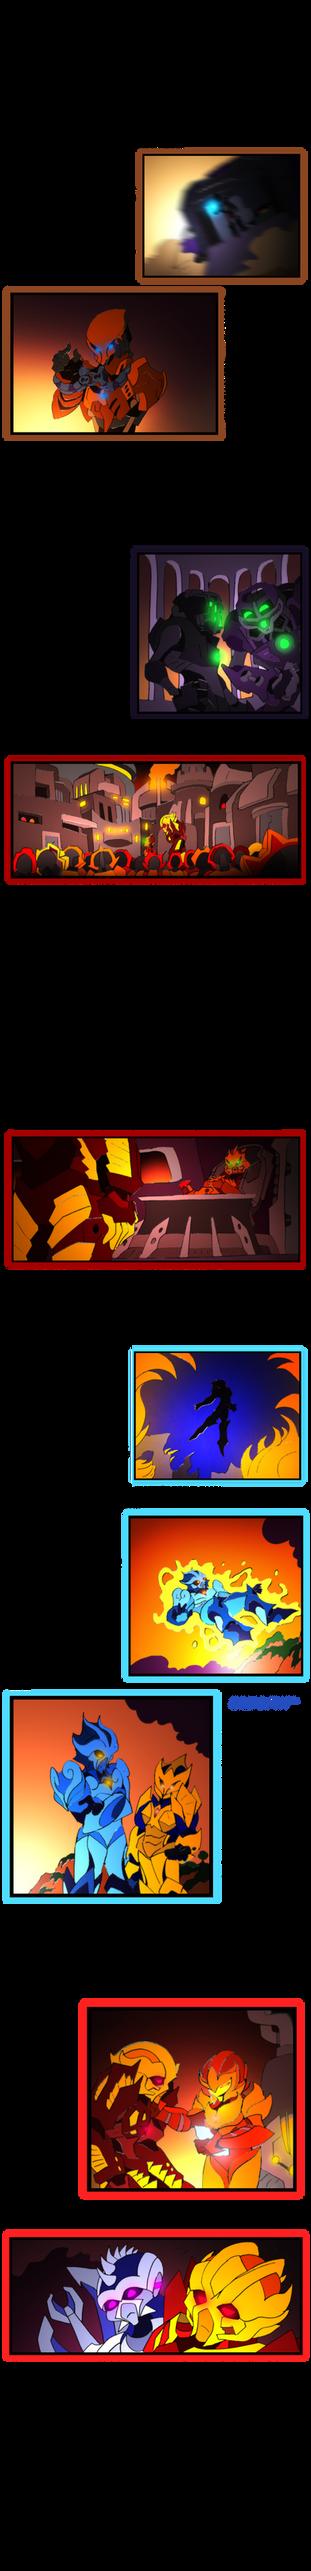 Bionicle- Nova Orbis- Mystery- Chapter 14